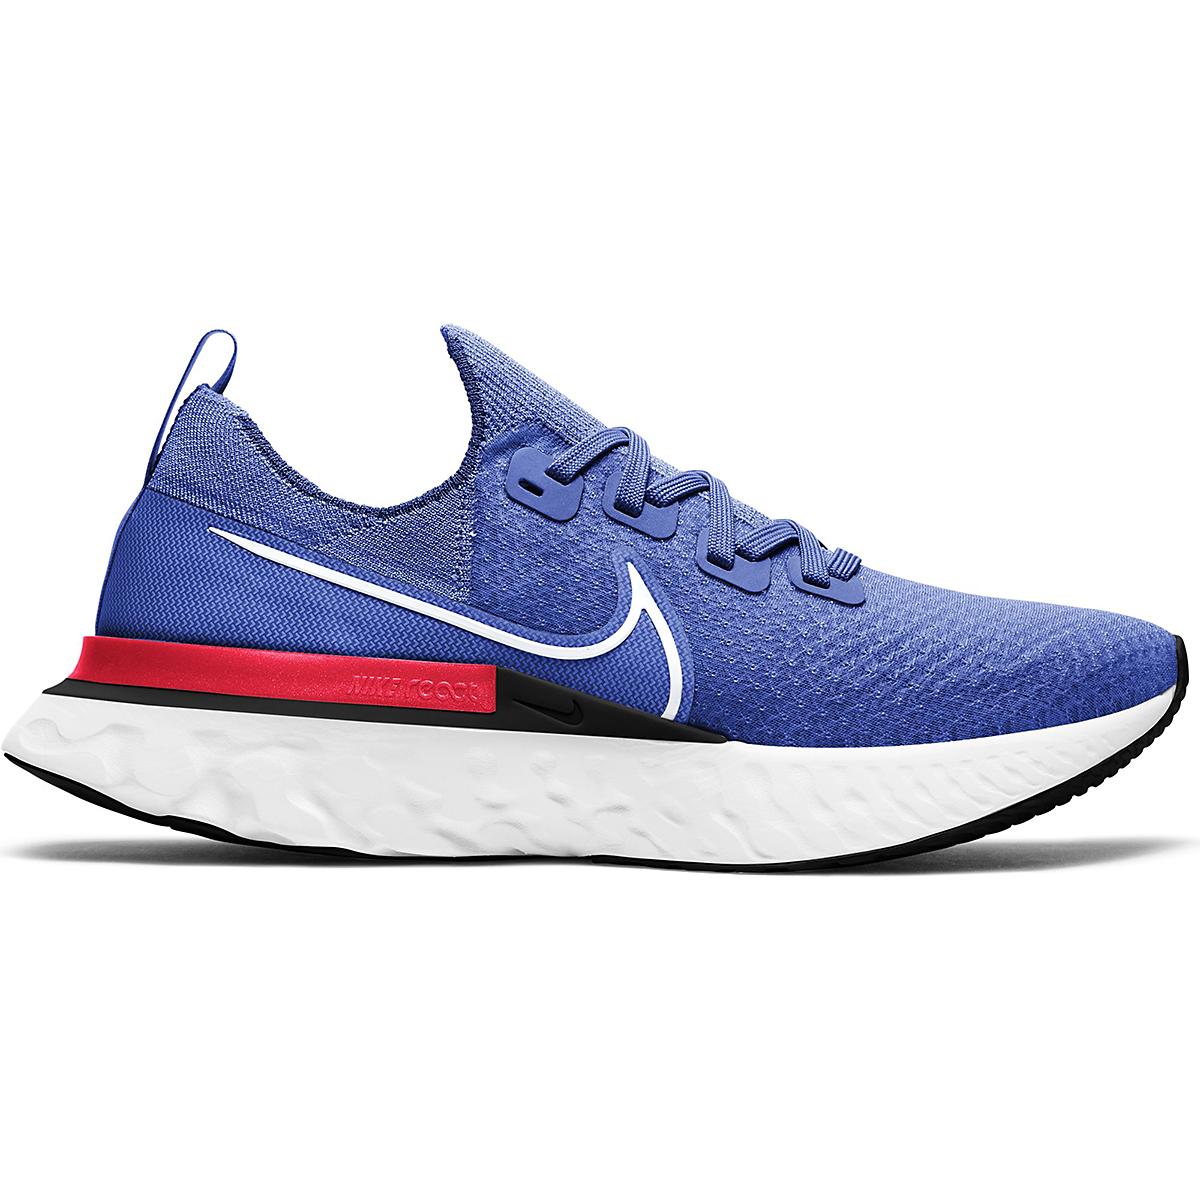 Men's Nike Nike React Infinity Run Flyknit Running Shoe - Color: Racer Blue/White-Bright Crimson-Black - Size: 6.5 - Width: Regular, Racer Blue/White-Bright Crimson-Black, large, image 1